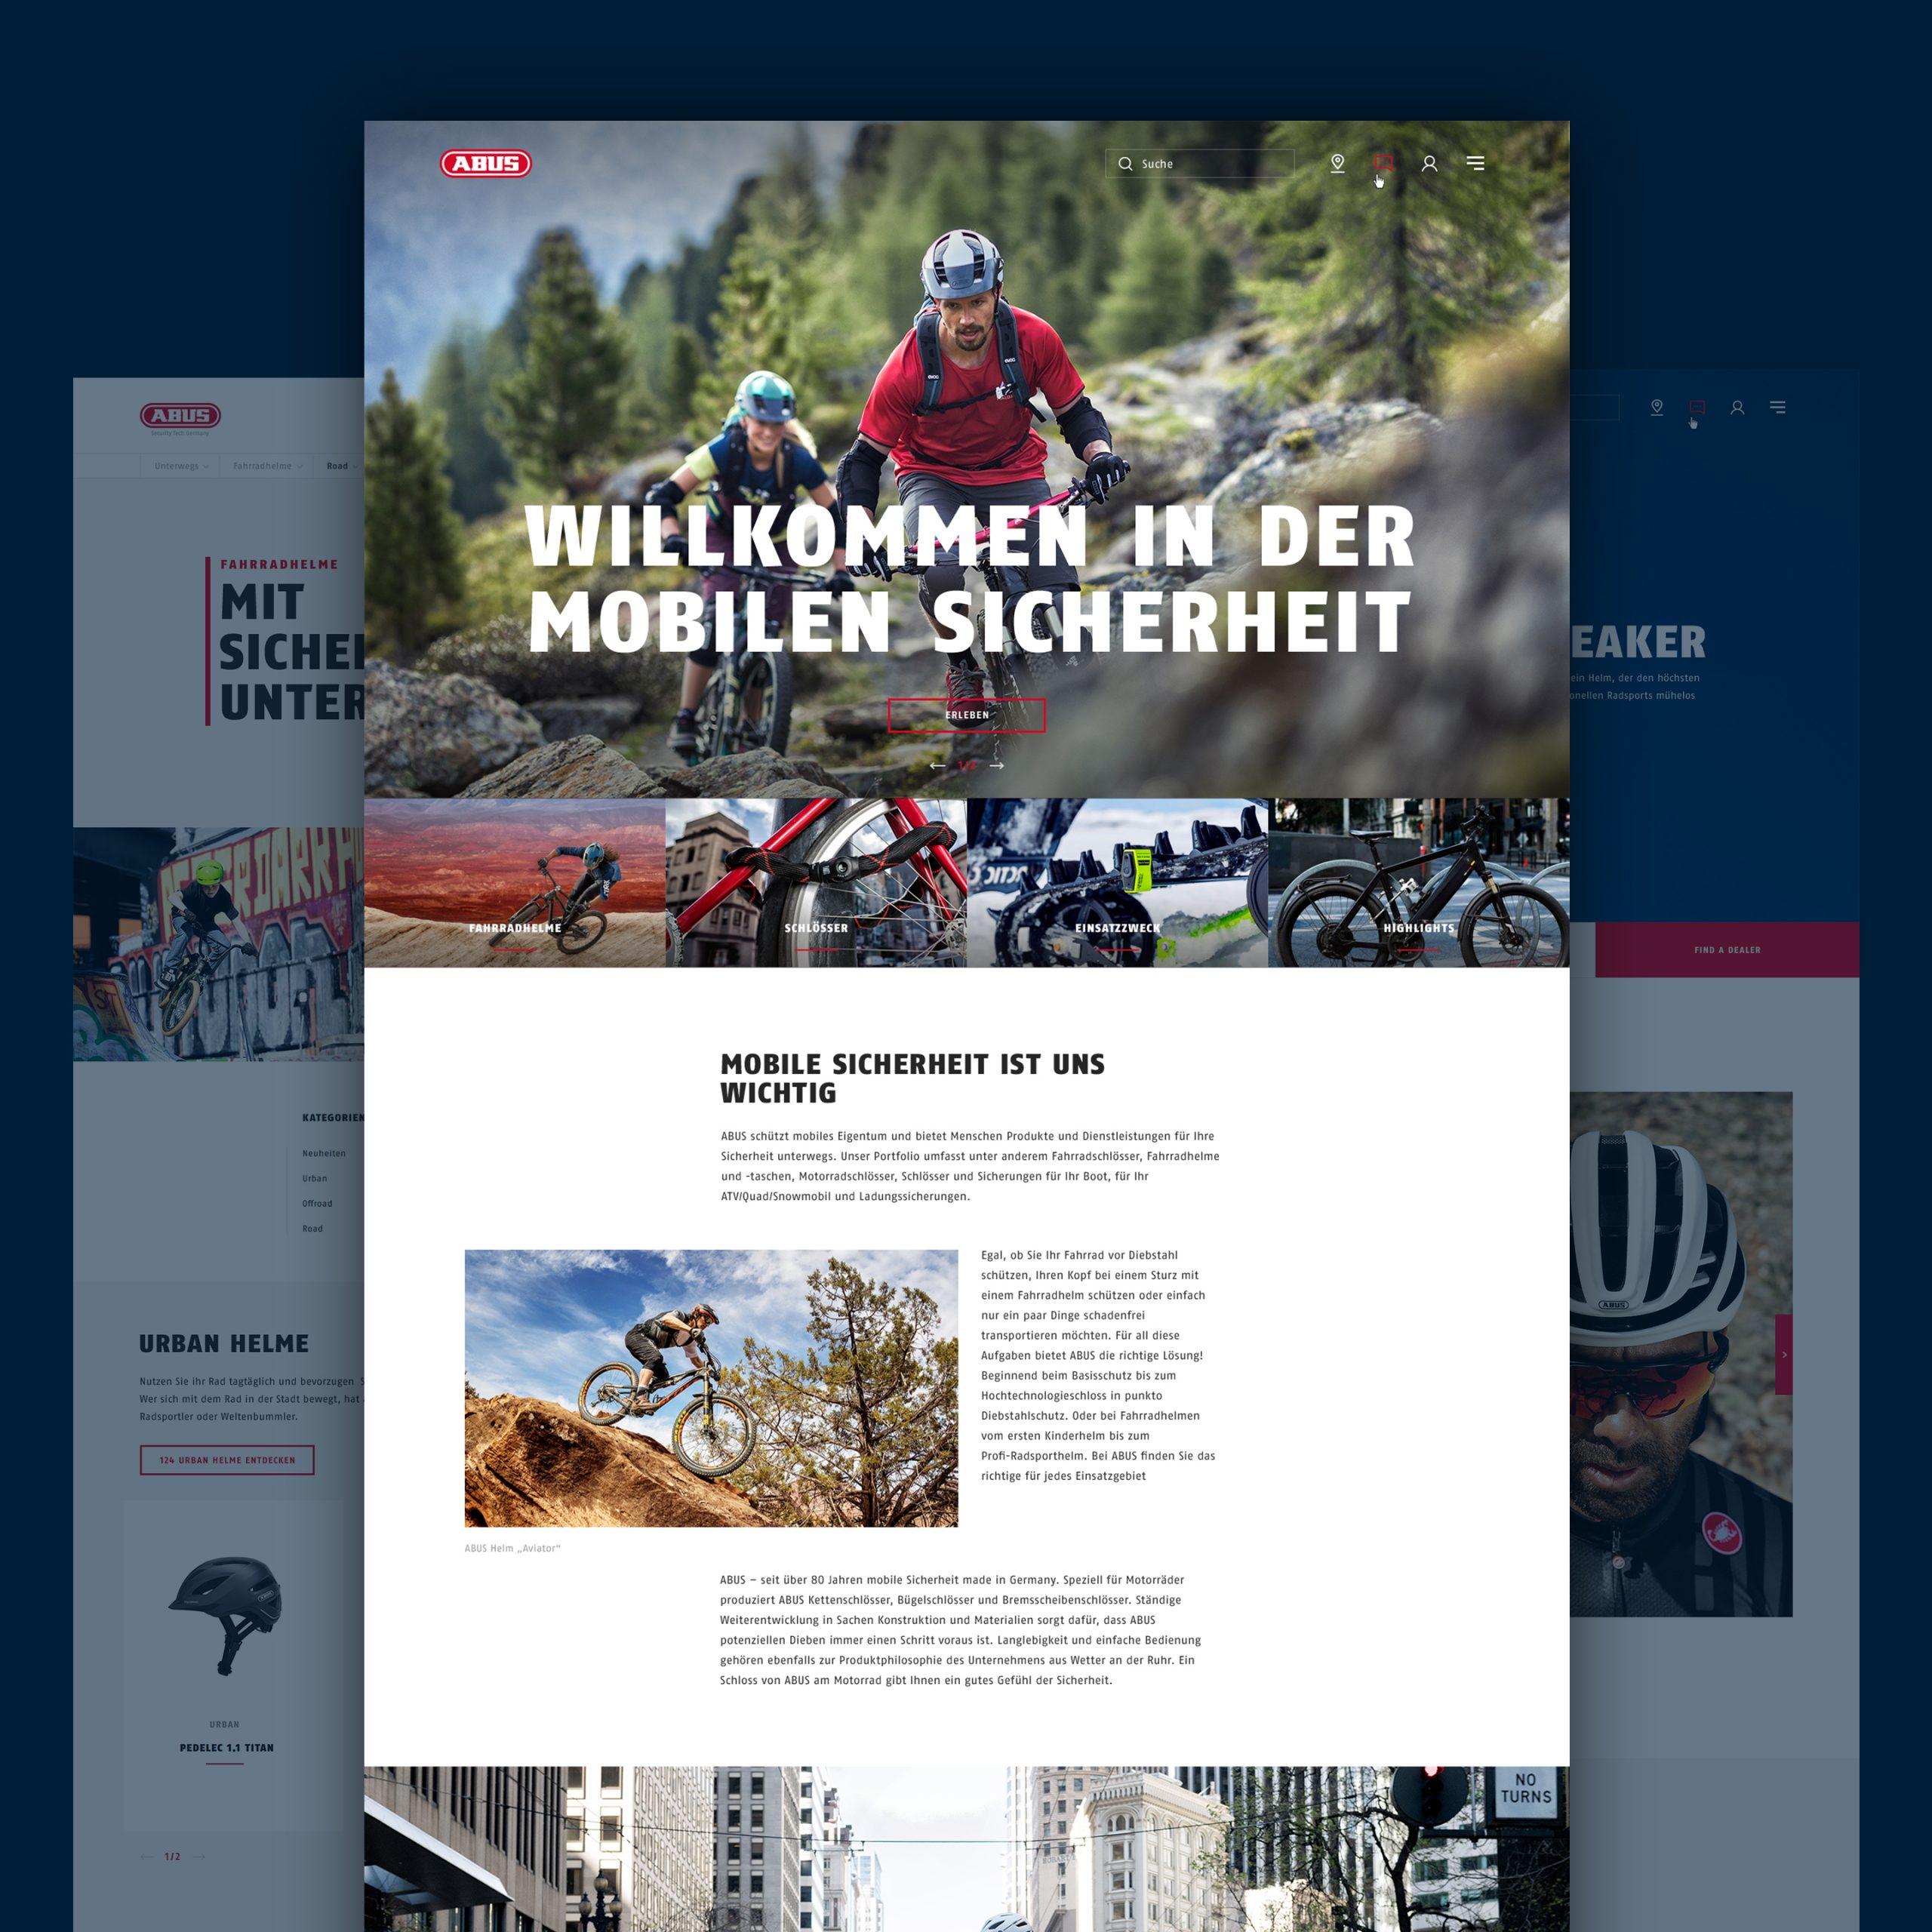 pascher-heinz-abus-website-digital-design-01